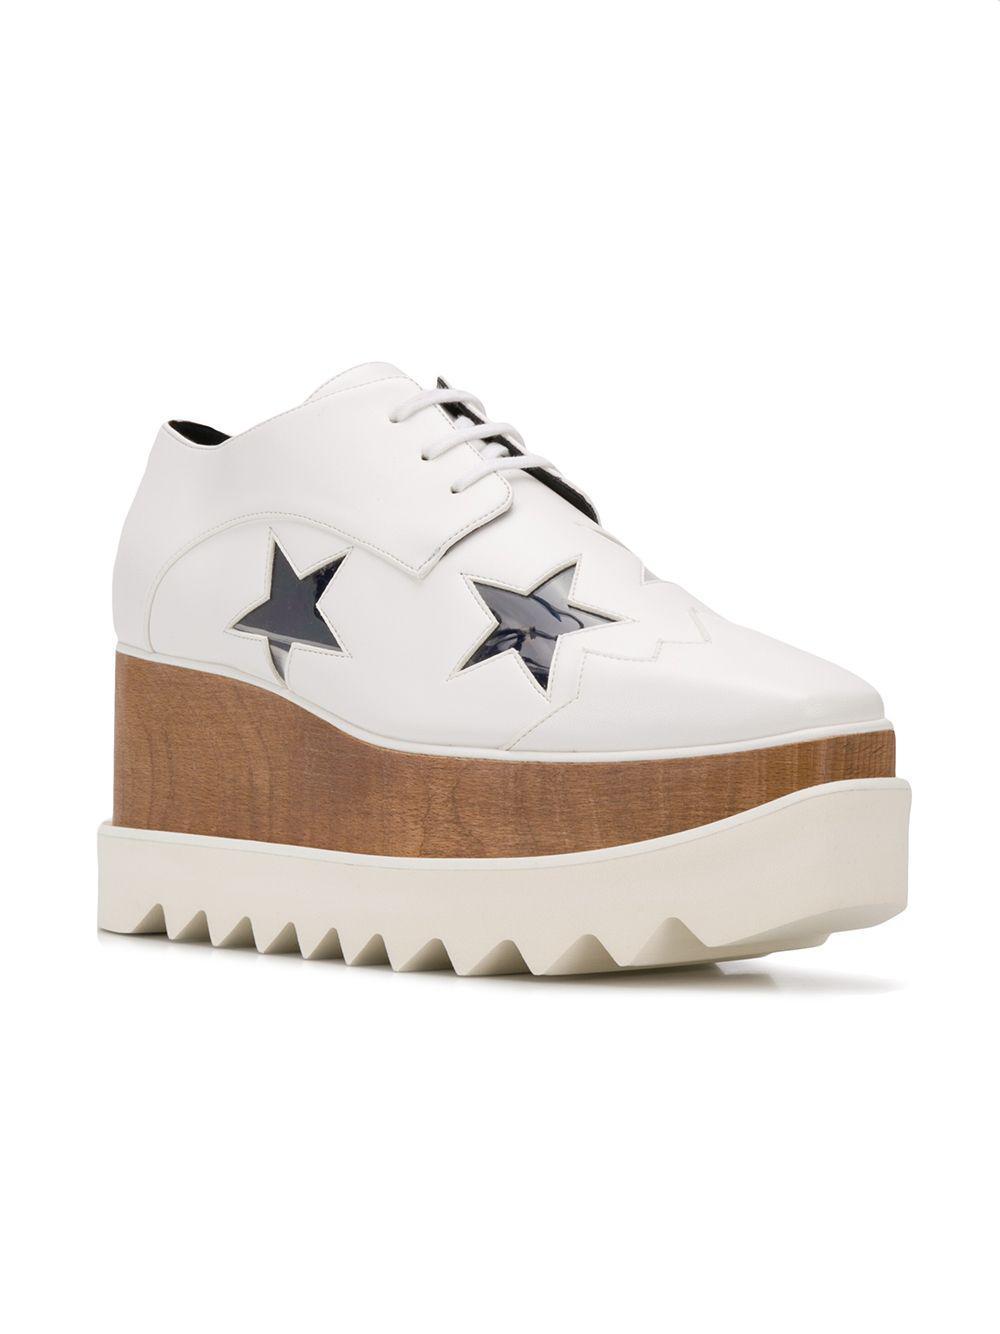 4479f85580a9 Lyst - Stella McCartney Elyse Star Sneakers in White